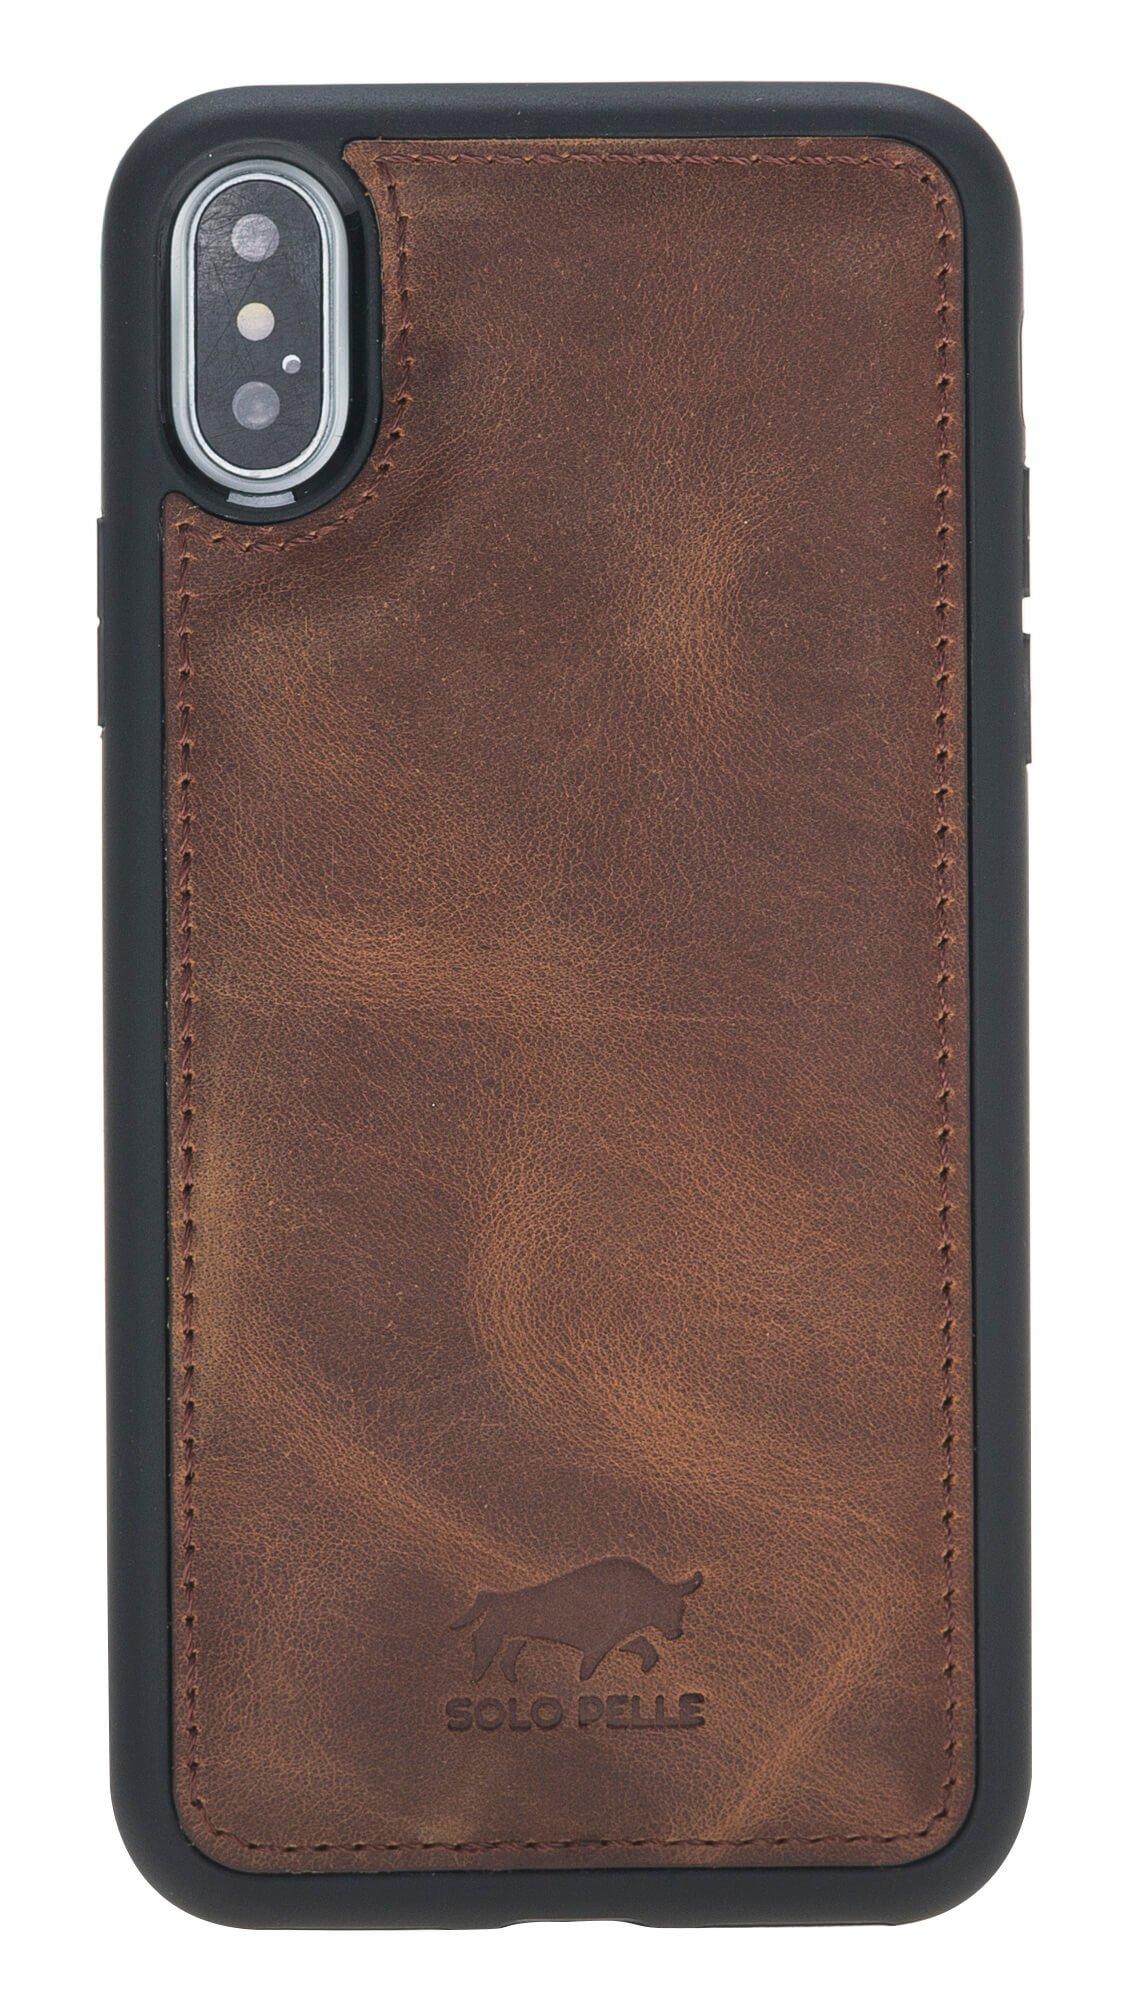 "iPhone X / XS Leder Hülle Tasche Lederhülle Ledertasche Backcover ""STANFORD"" (Vintage Braun)"